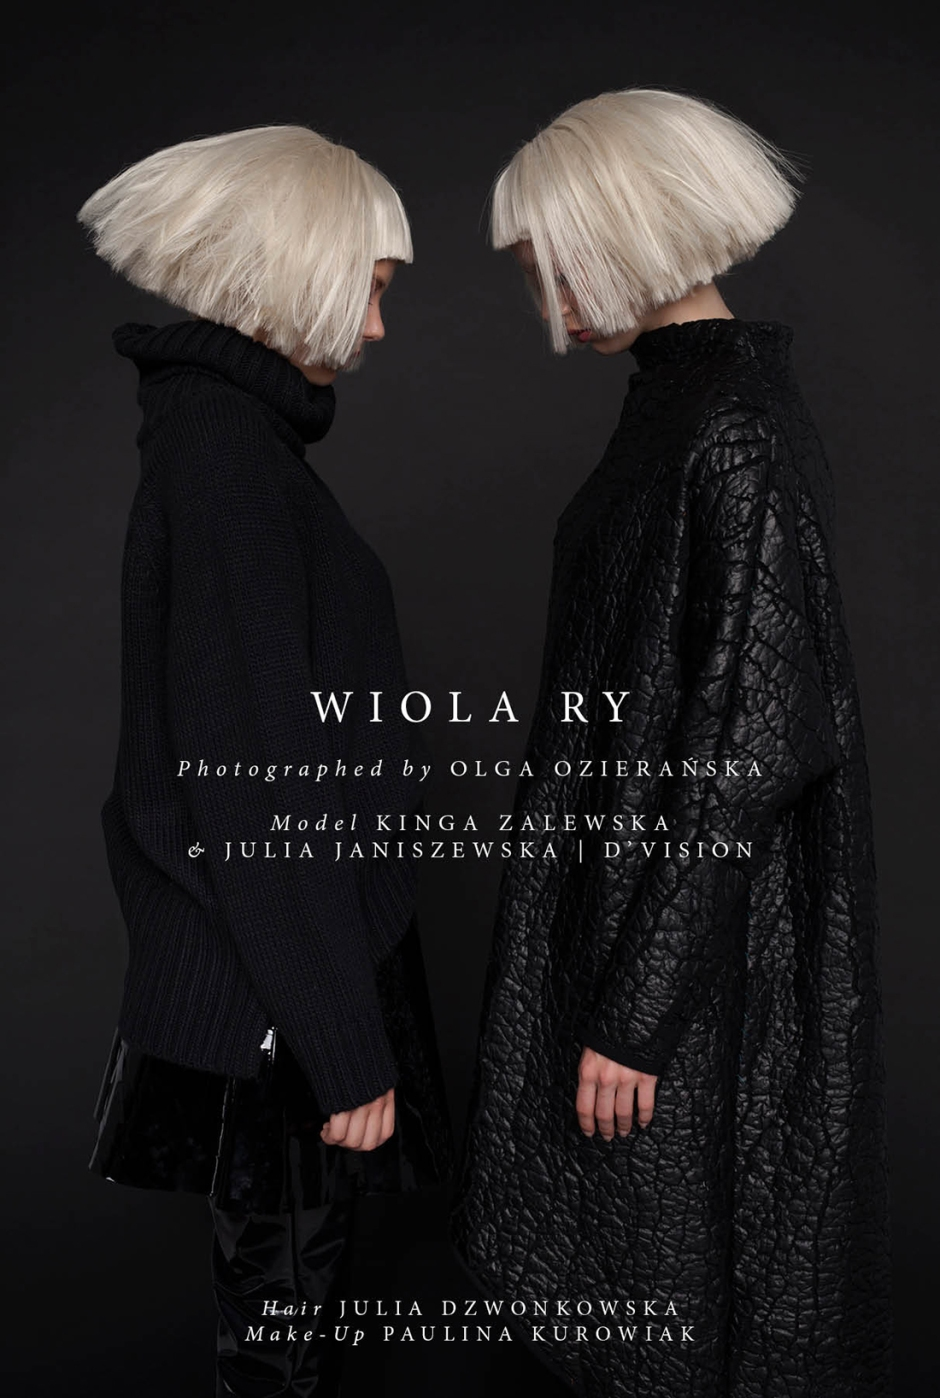 wiola-ry